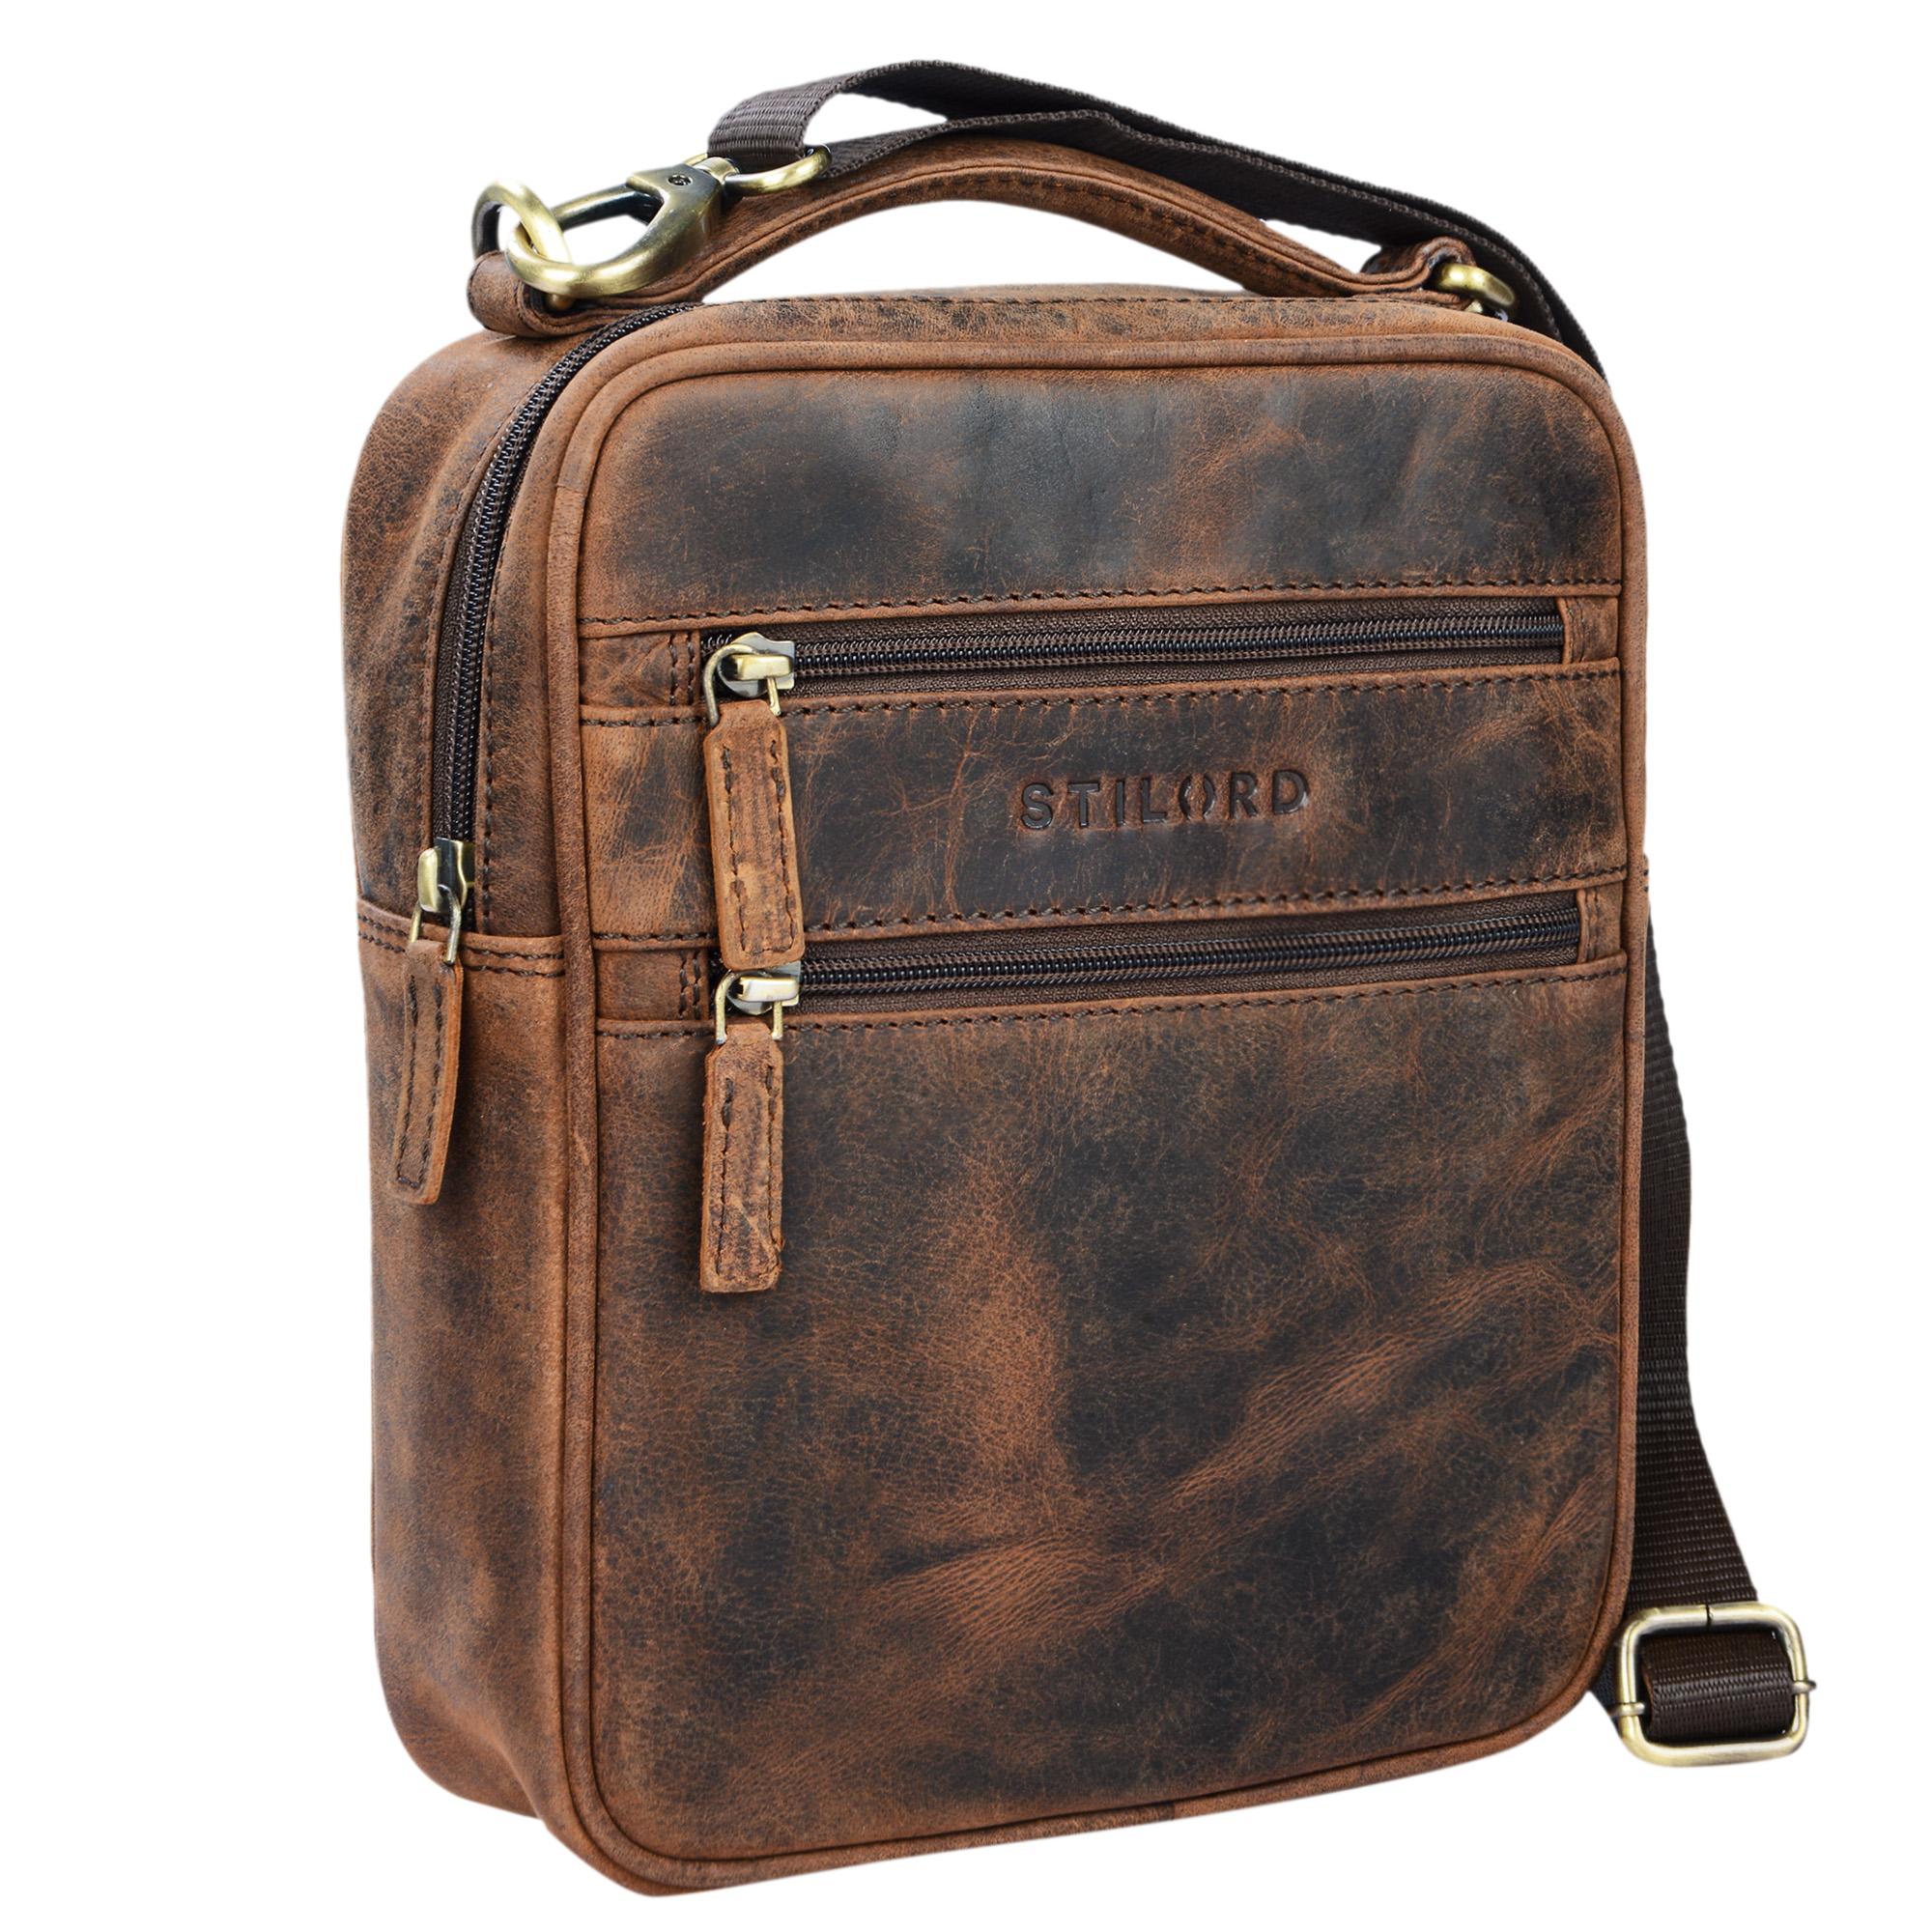 stilord mats herren handtasche leder vintage kleine messenger bag mit tragegriff tablettasche. Black Bedroom Furniture Sets. Home Design Ideas